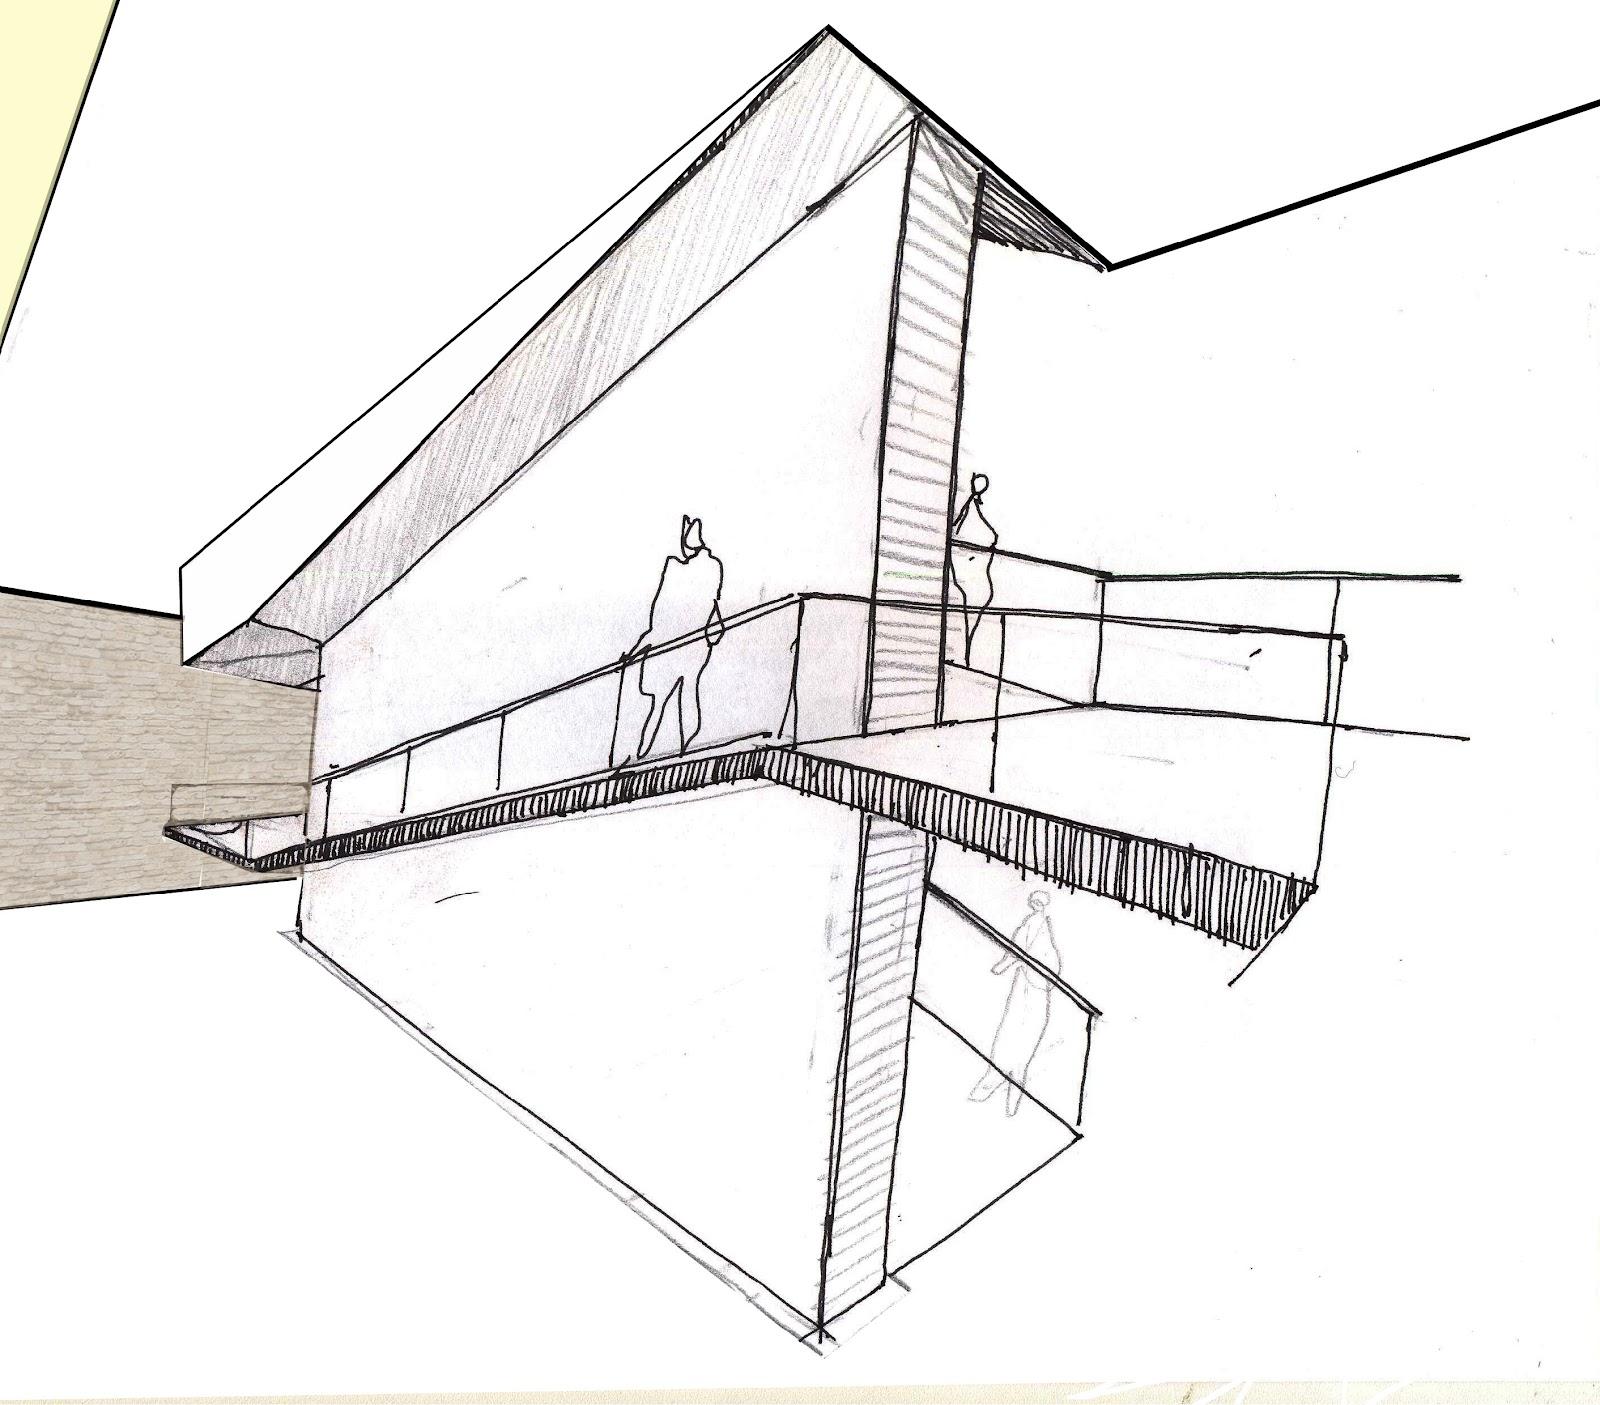 Arquitectura dise o originalidad dise o de rampa planta - Arquitectura de diseno ...